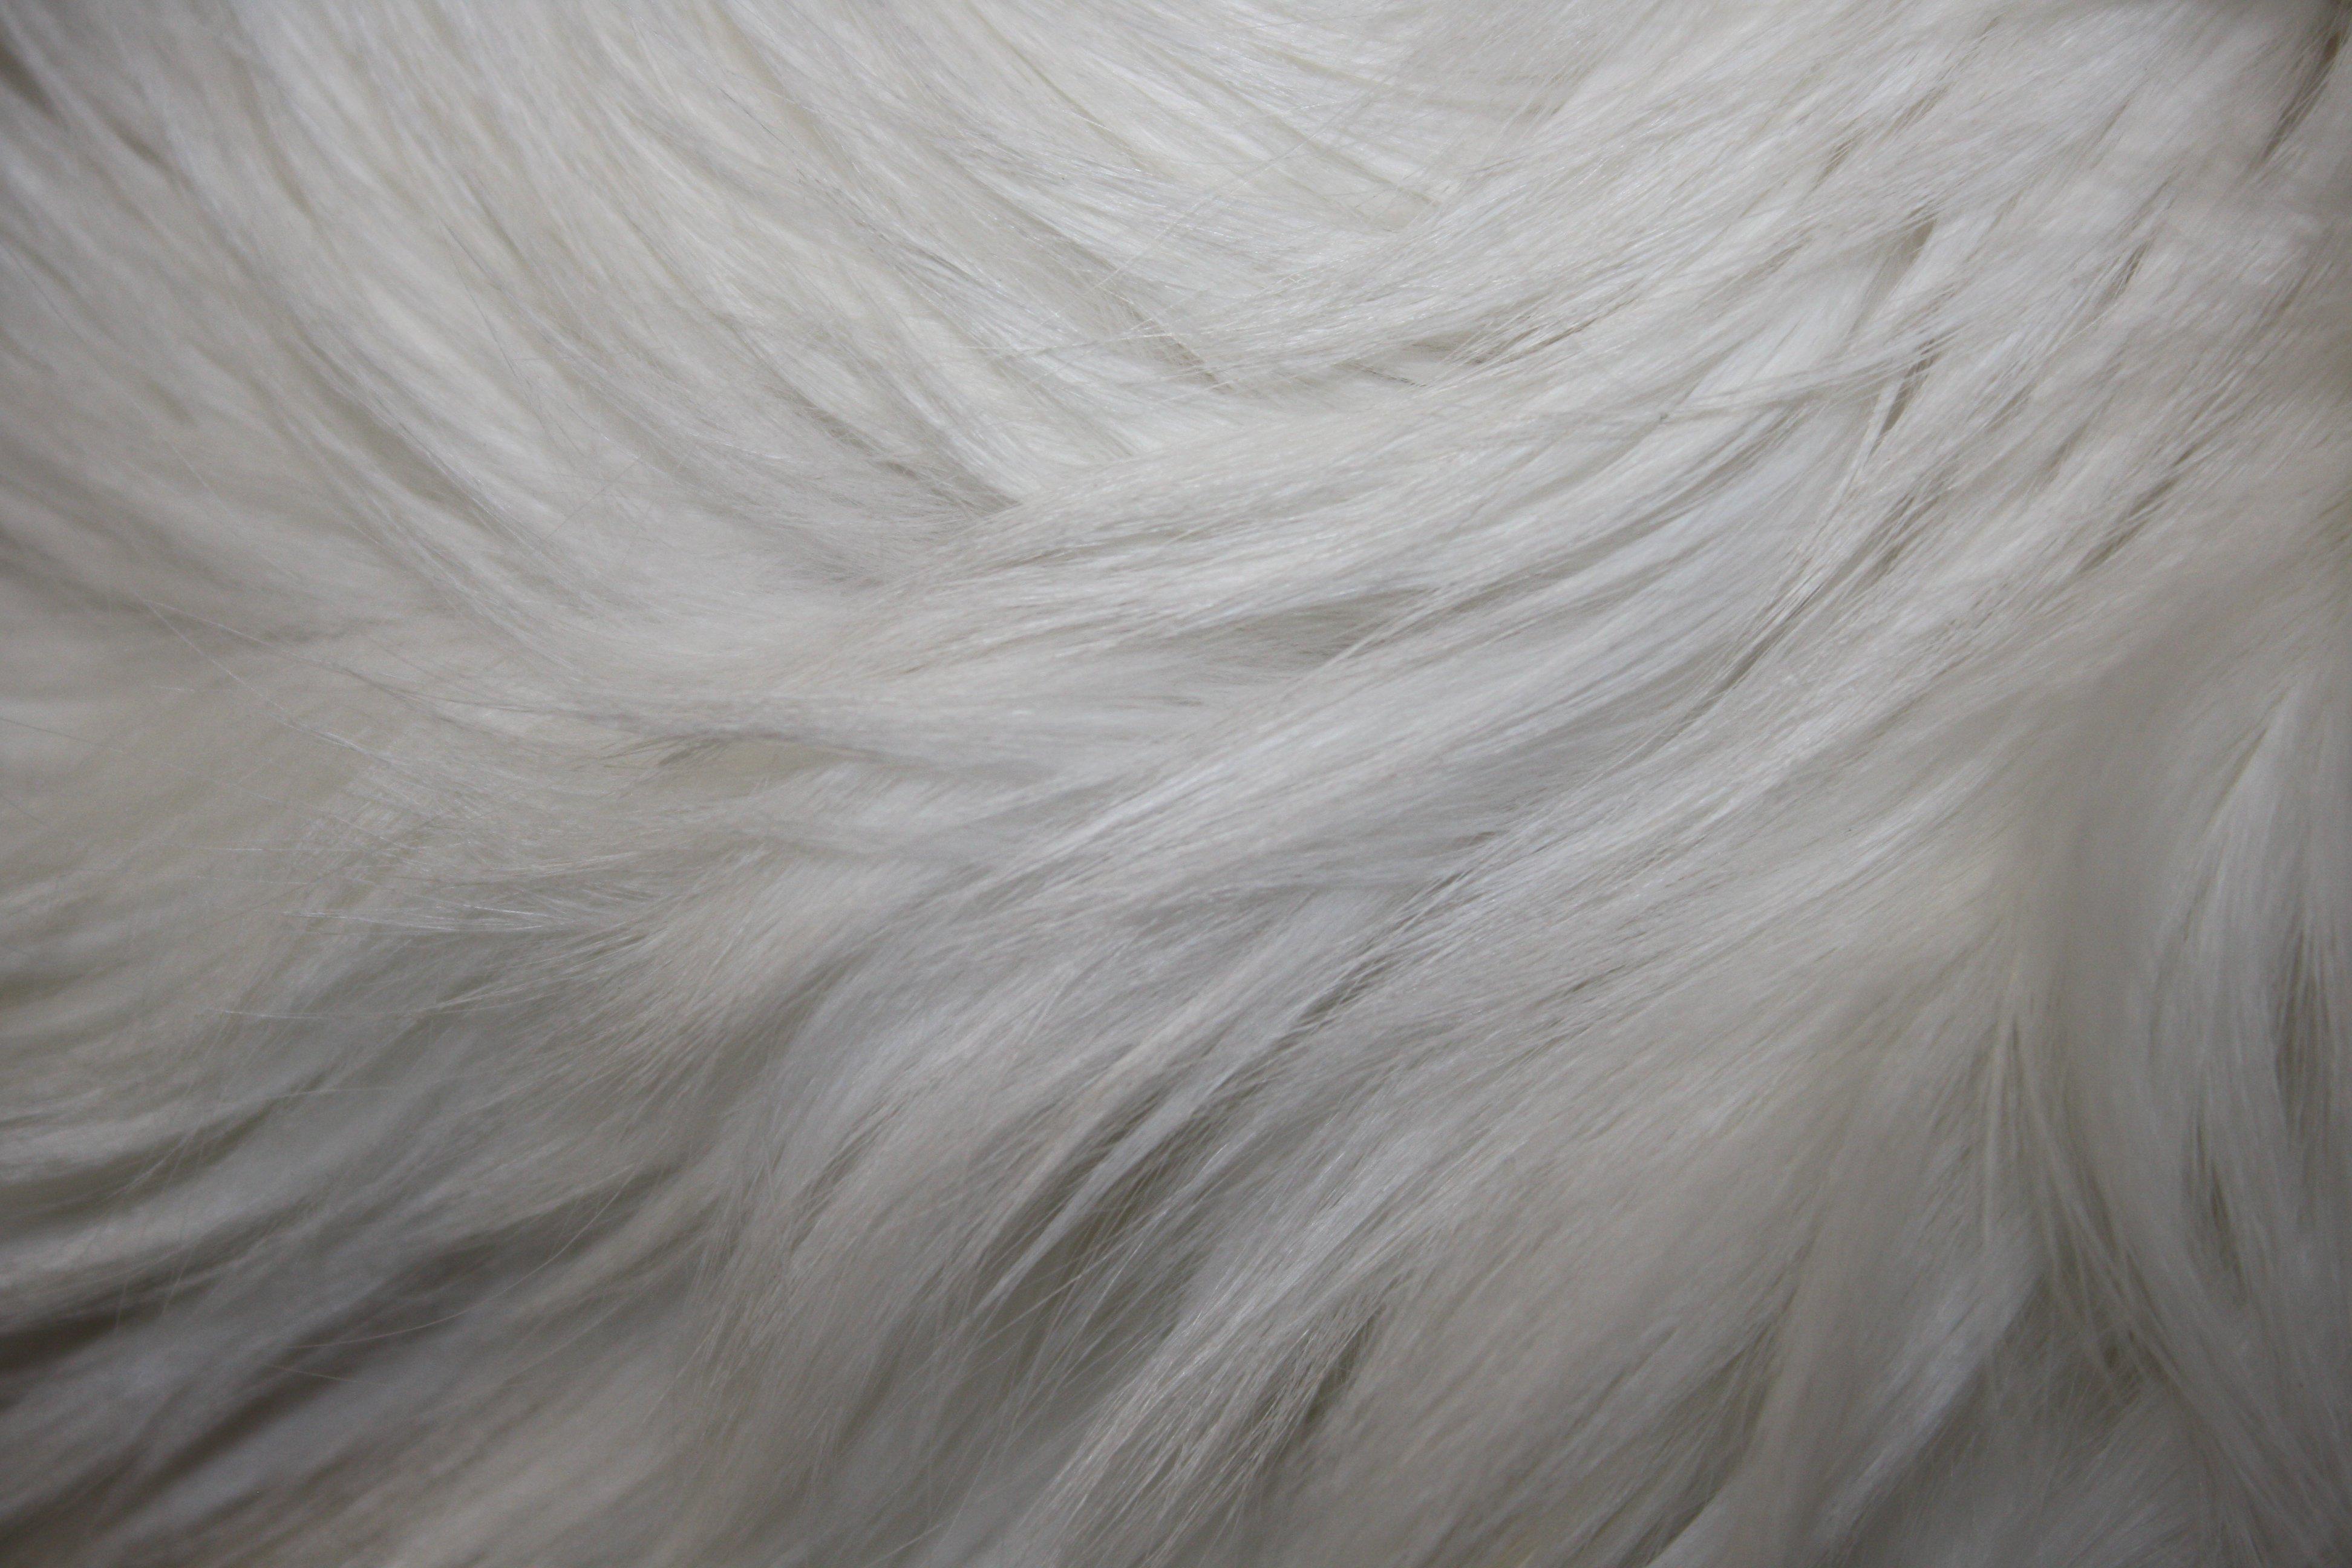 White Fur Texture   High Resolution Photo   Dimensions 3888 3888x2592